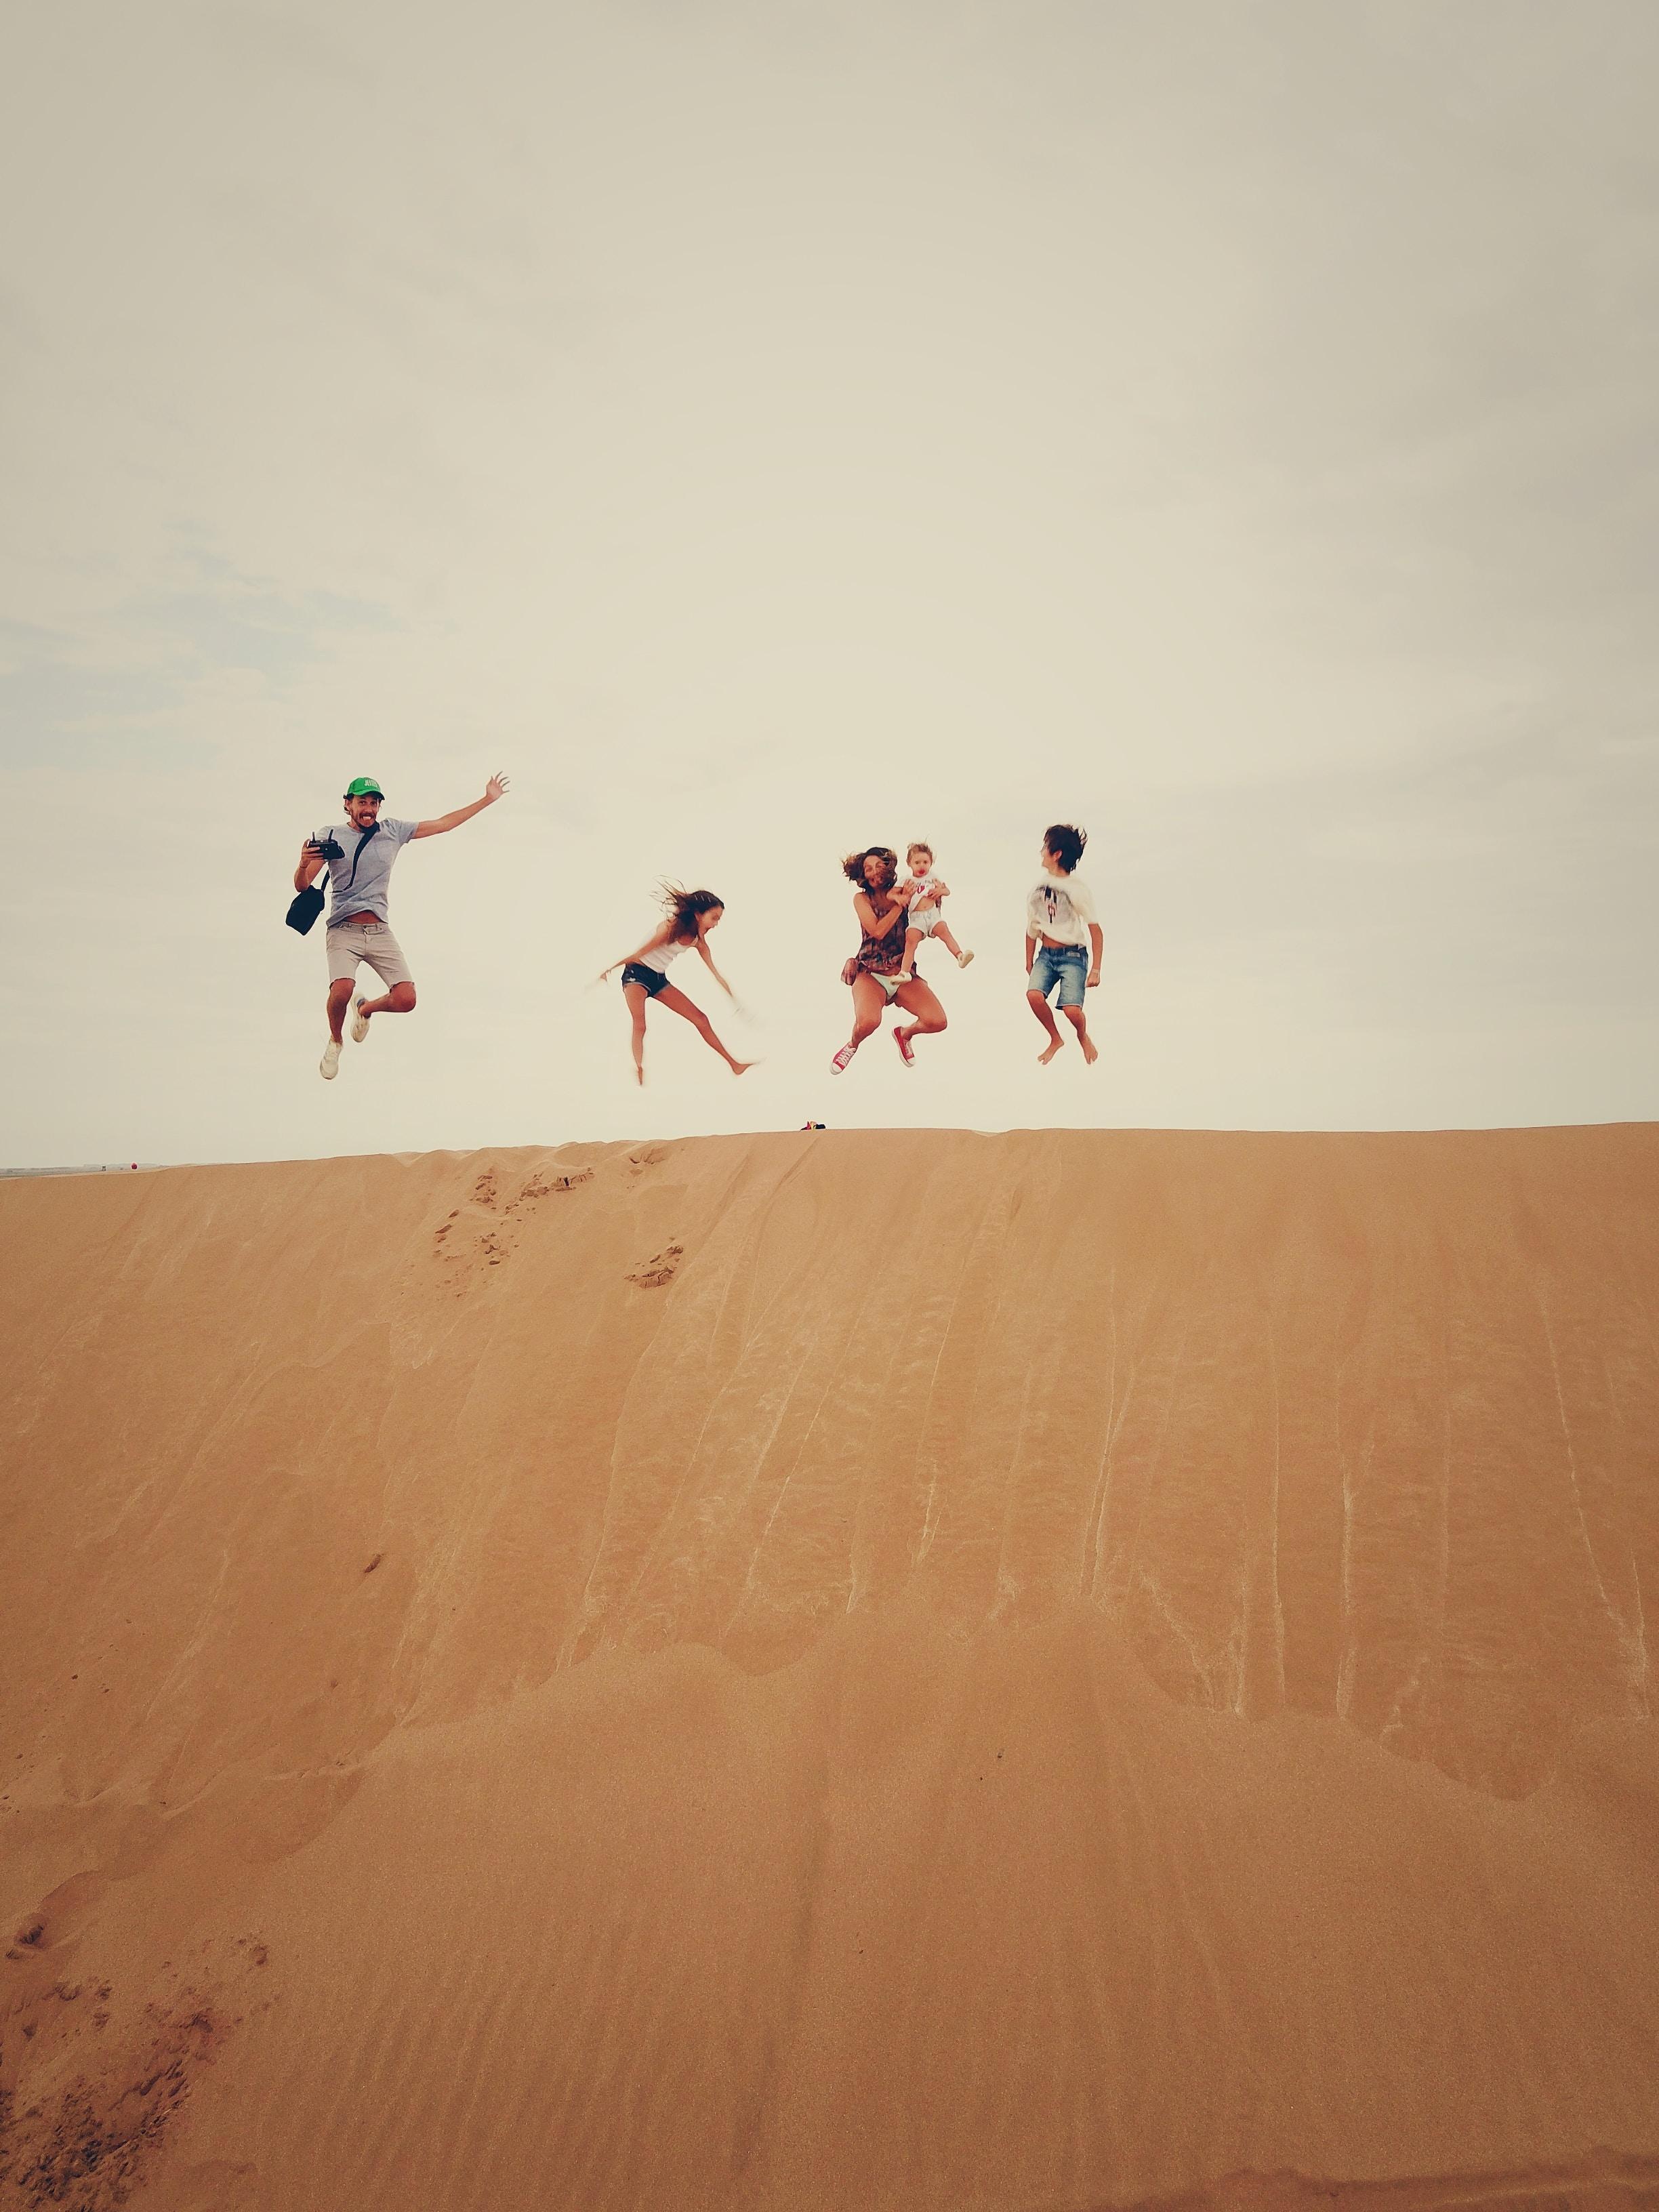 people jumping on sand